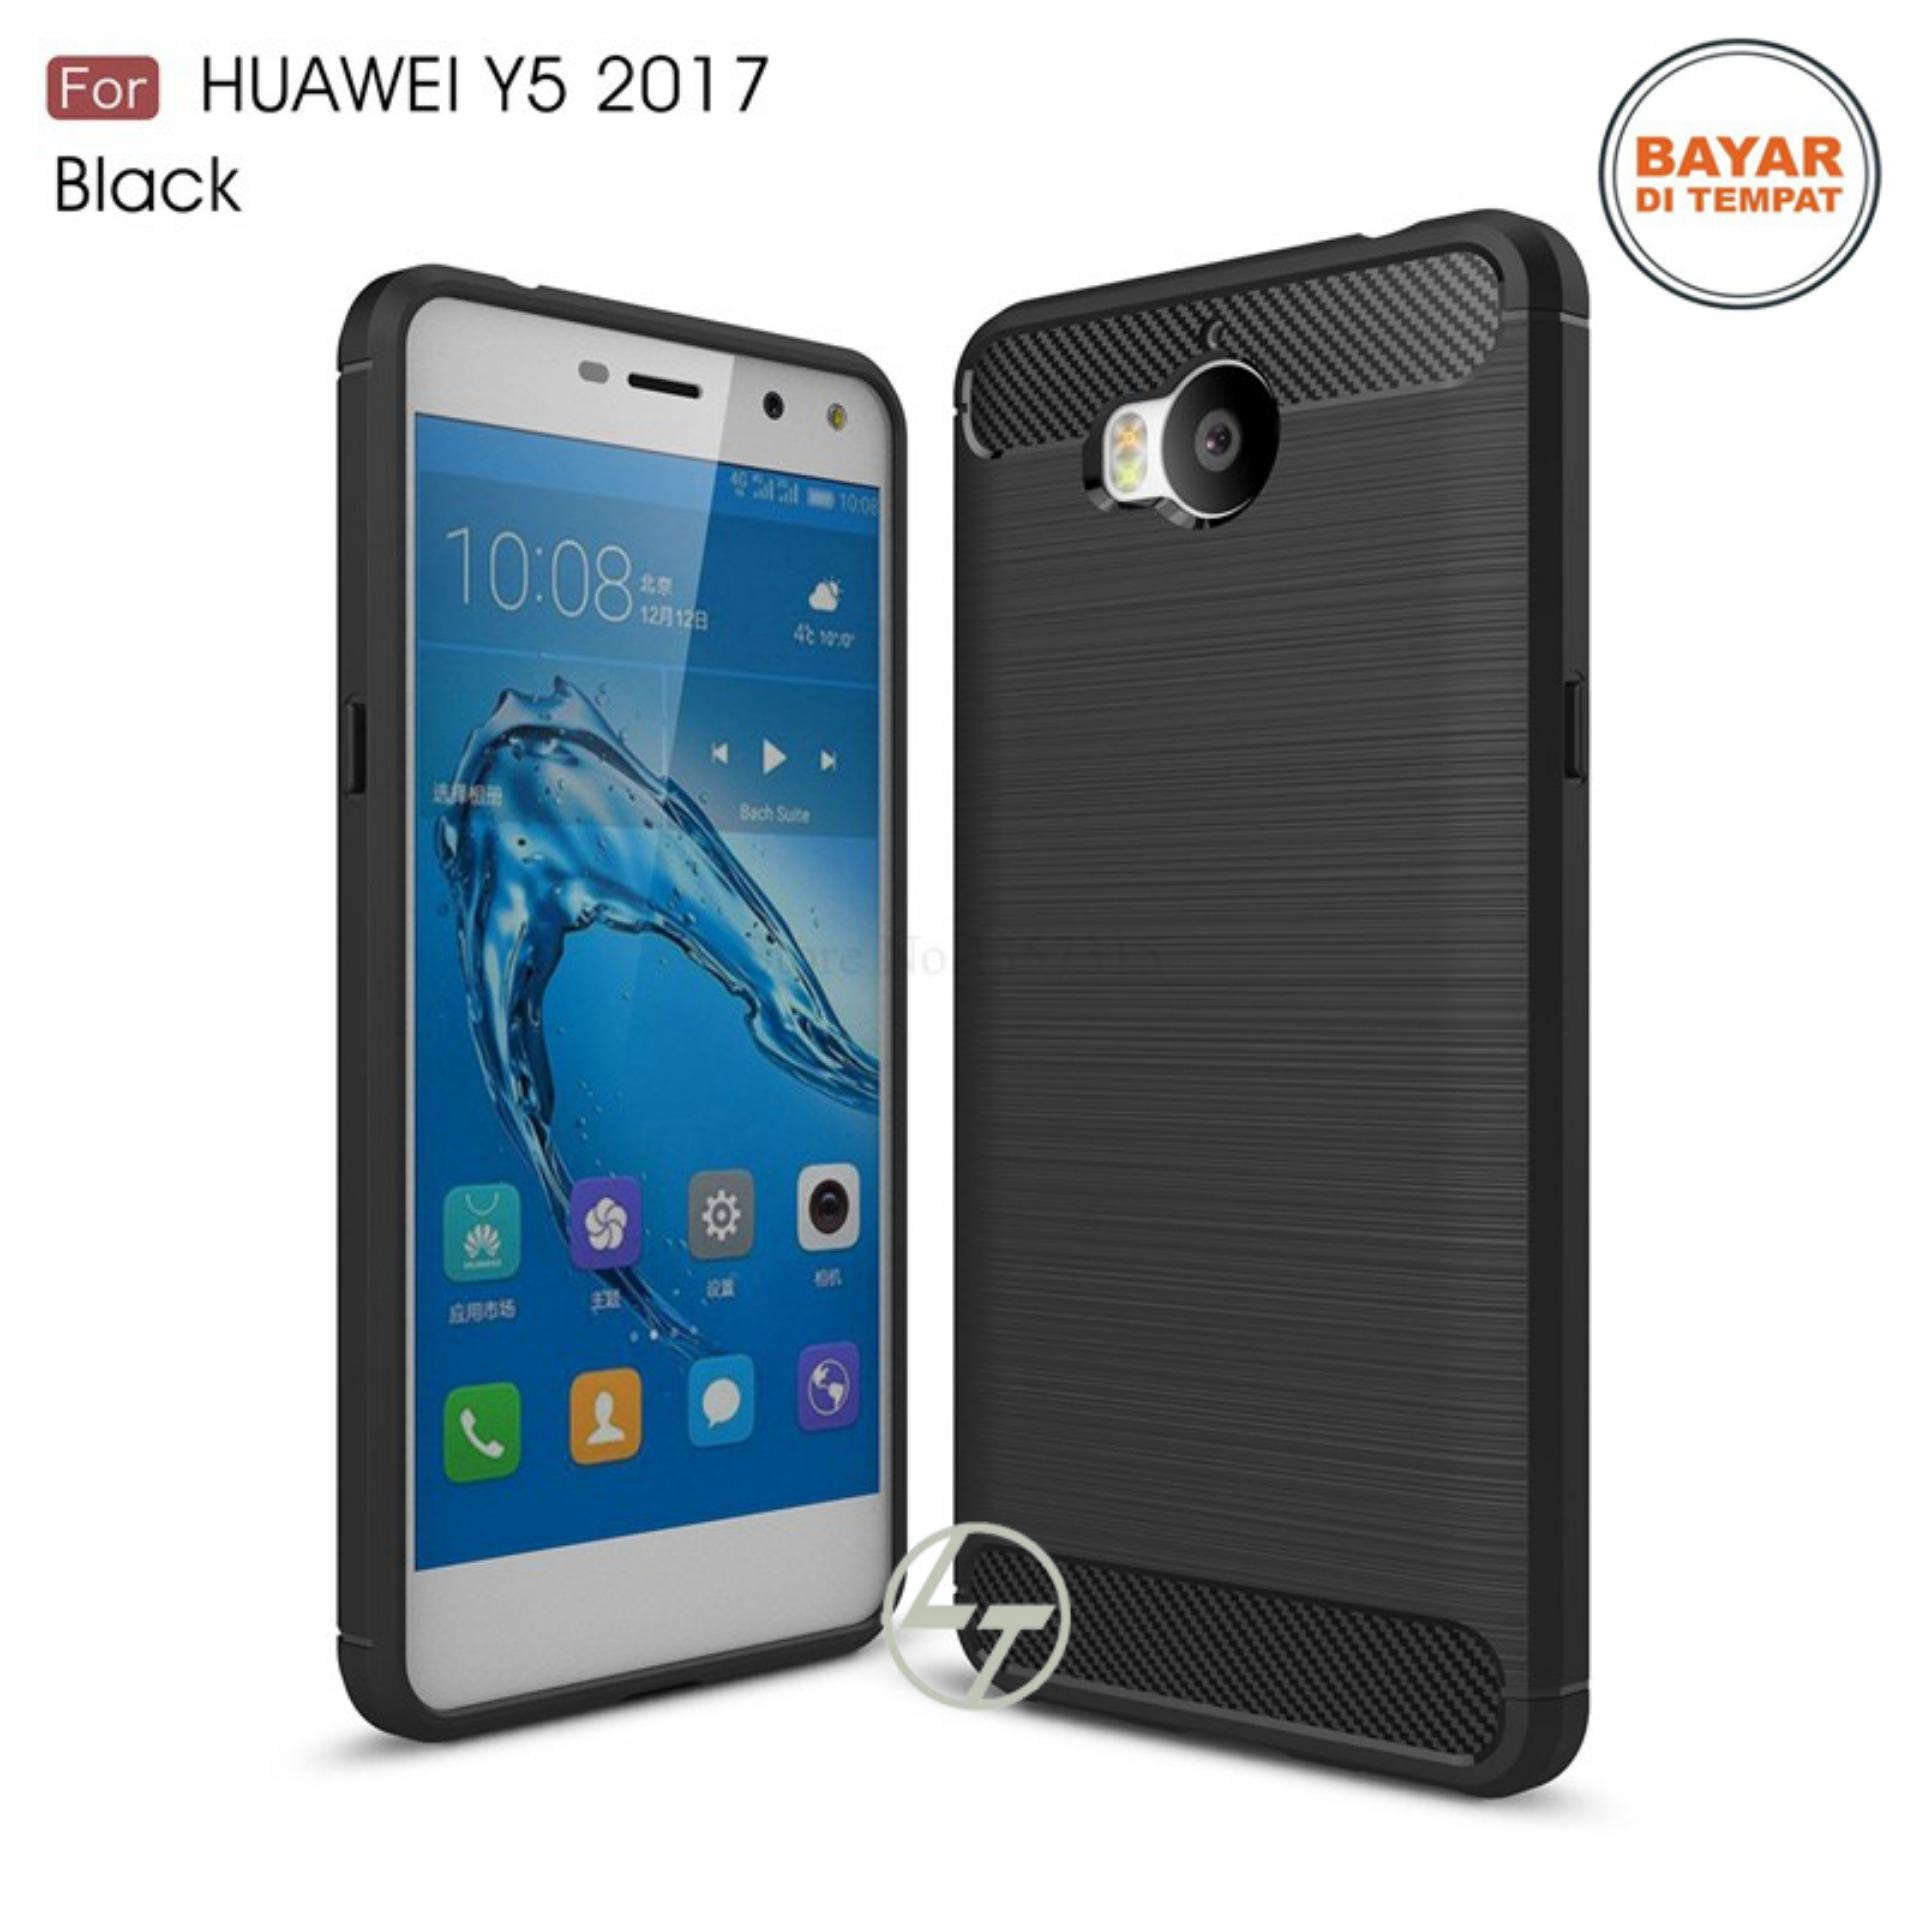 Lapak Case Carbon Fiber Premium Quality Shockproof TPU for Huawei Y5 2017 / Y5II - Hitam